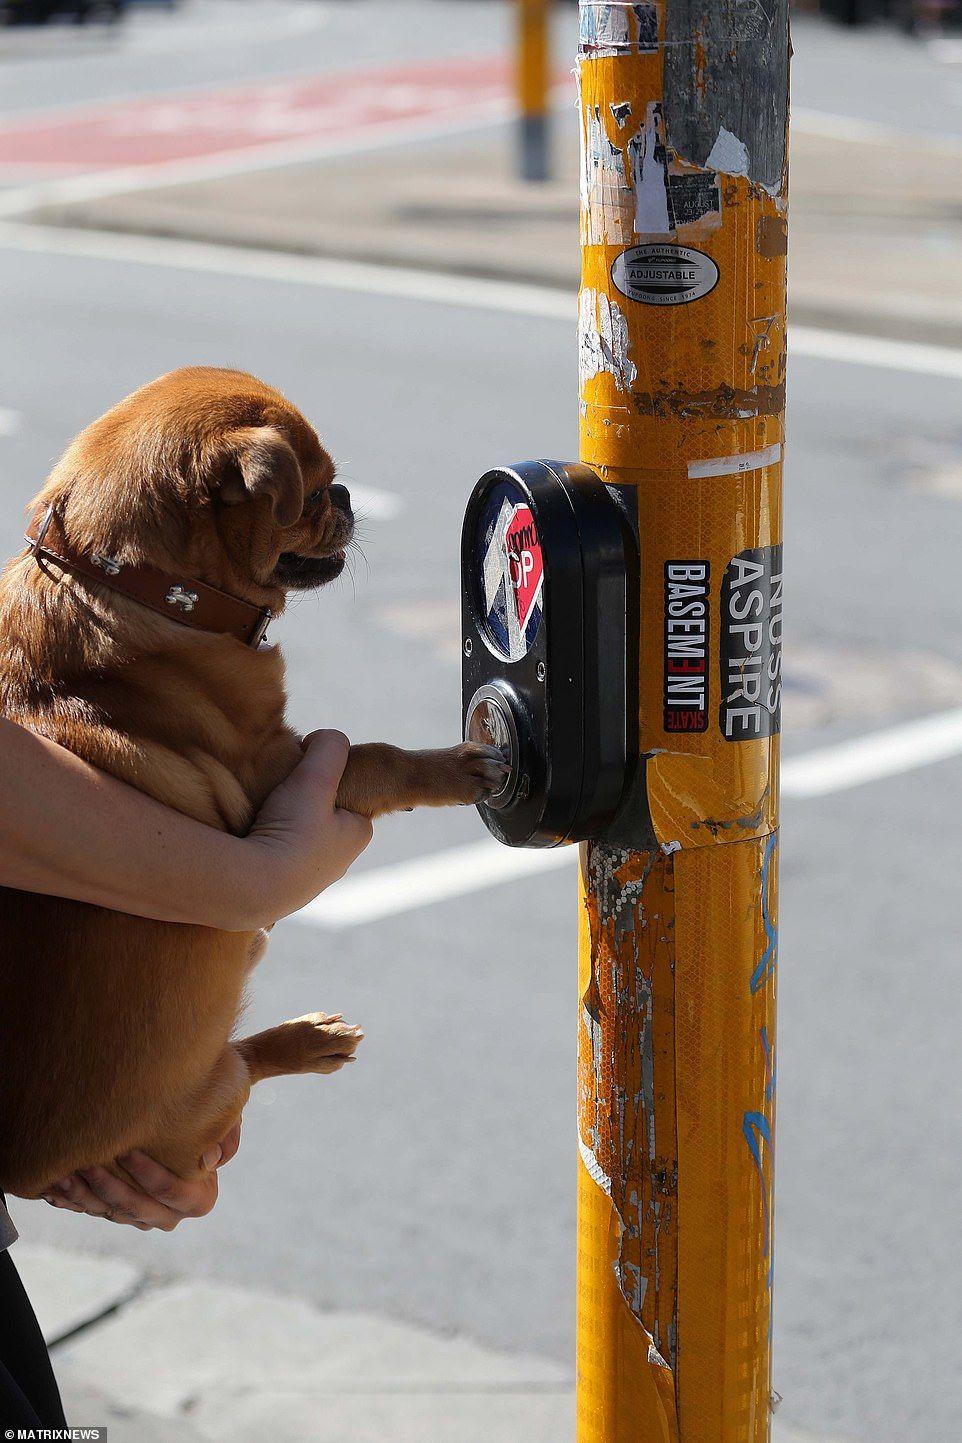 How to avoid covid at crosswalks